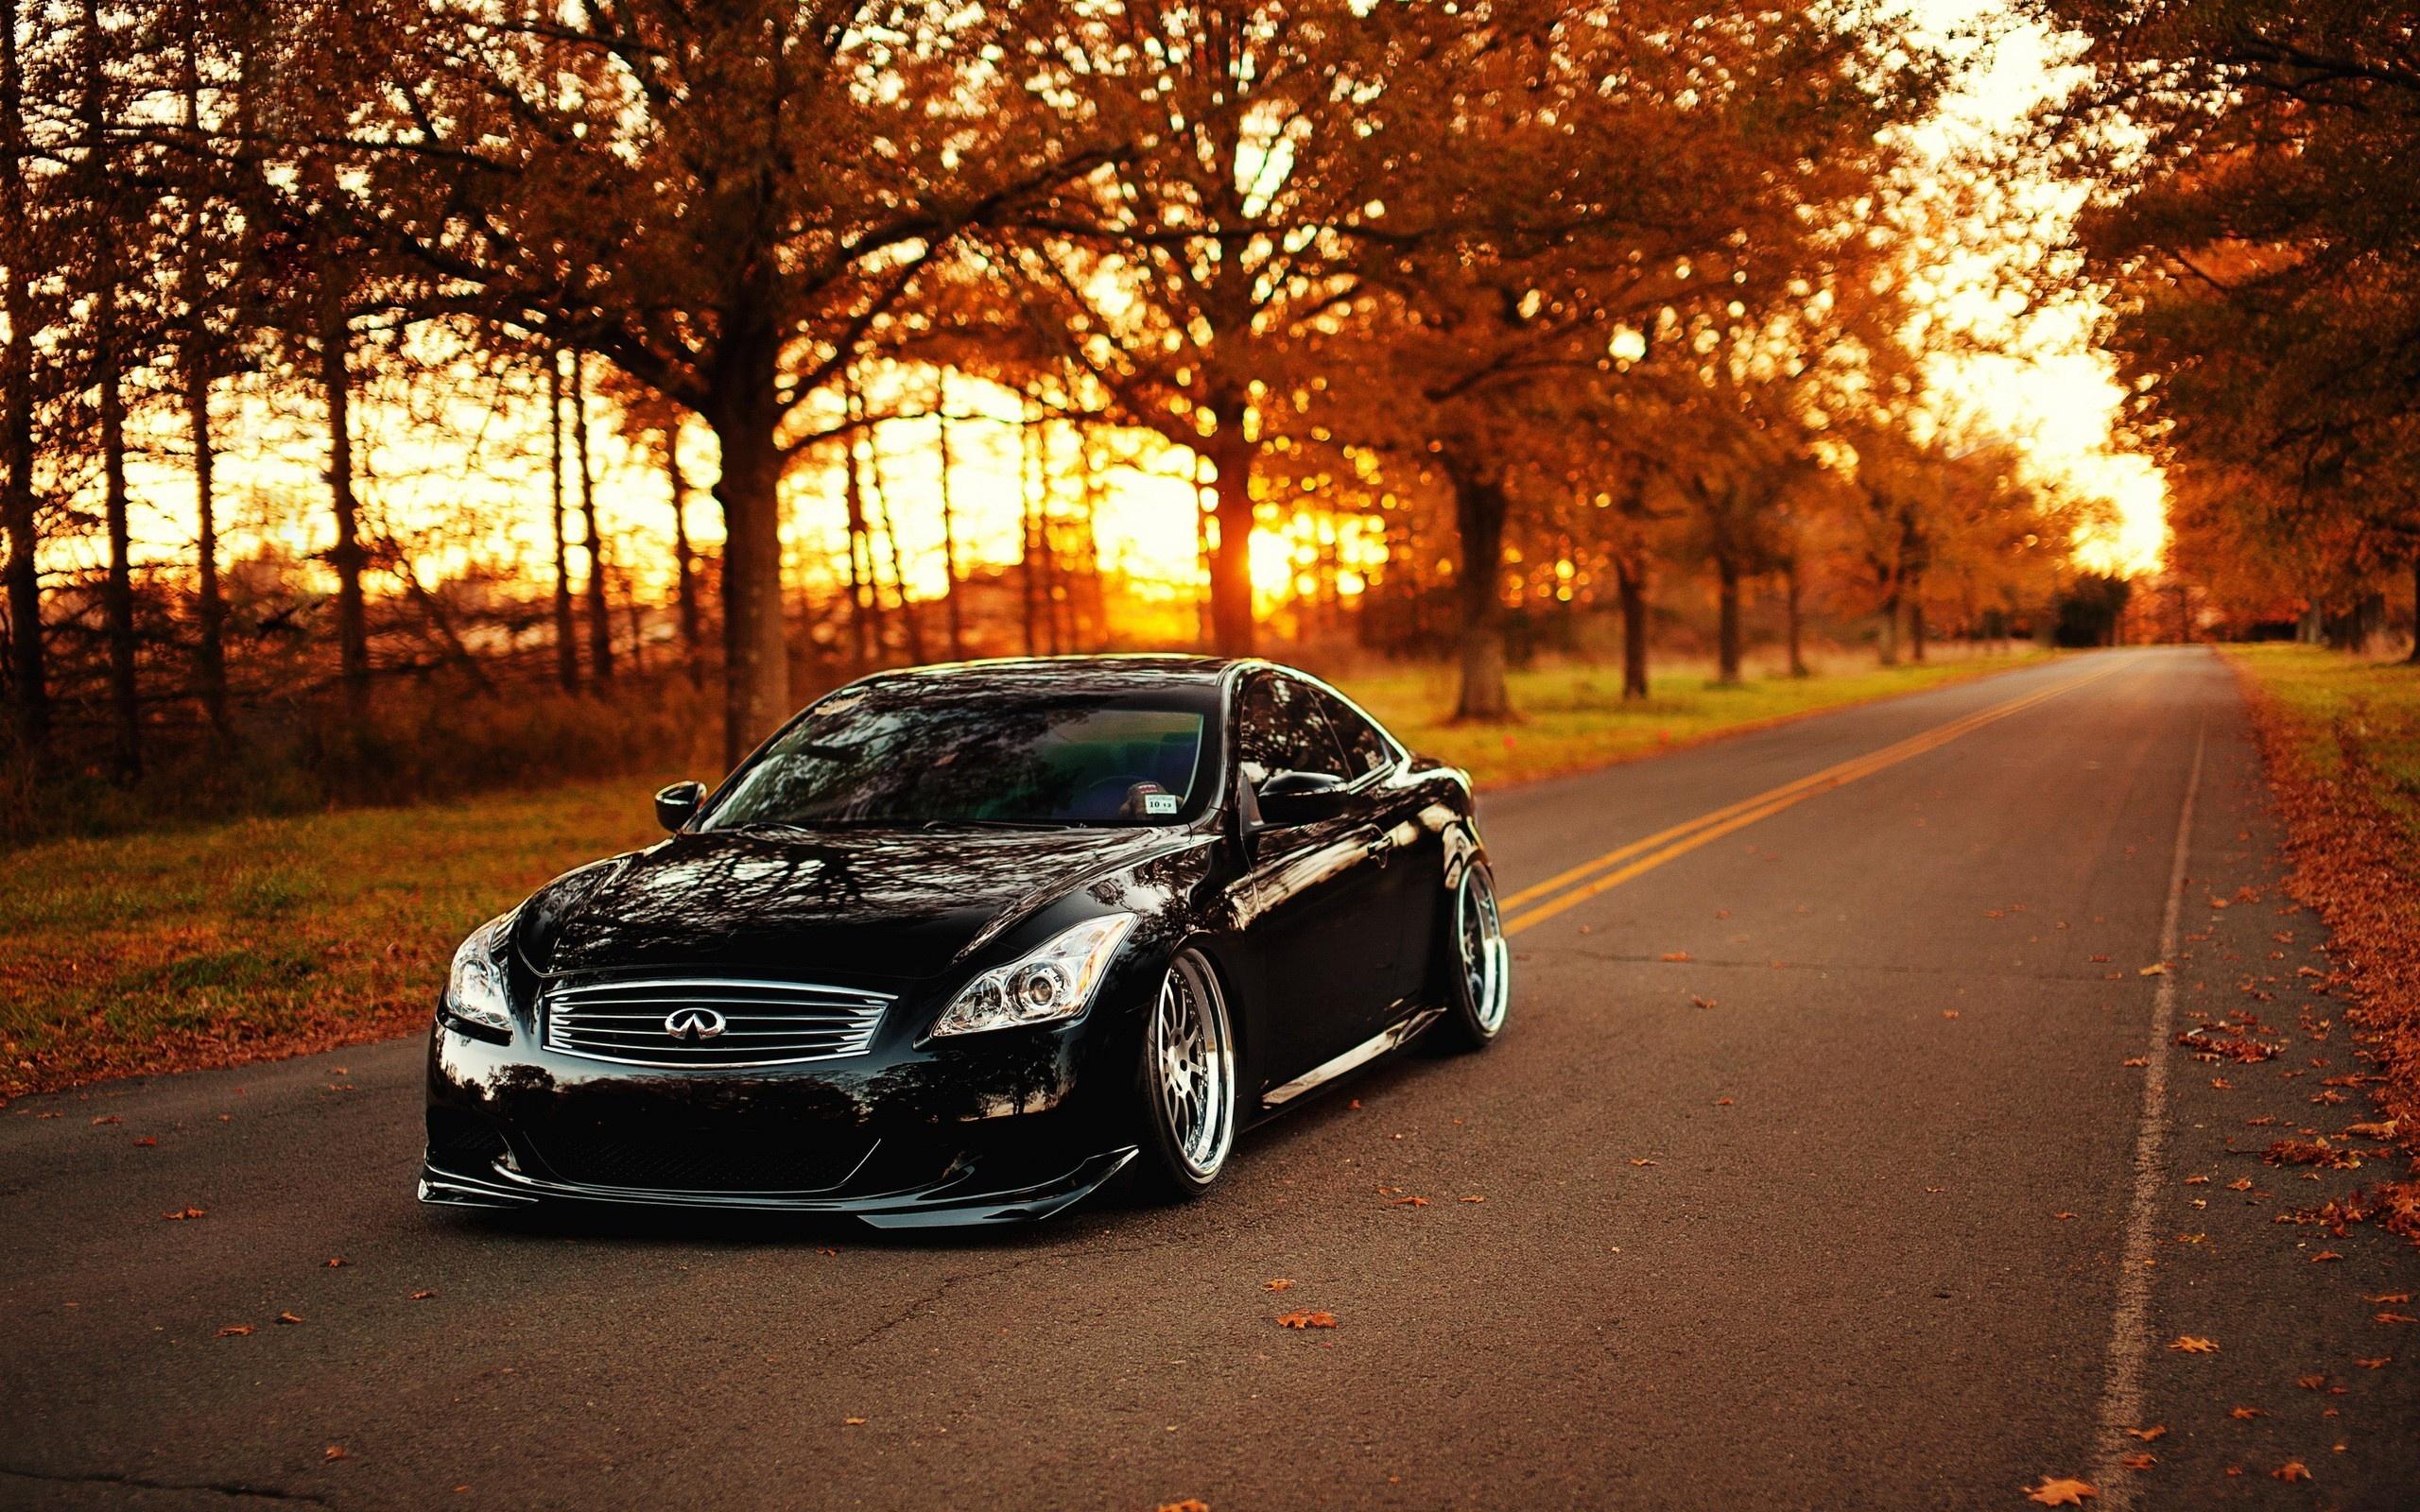 jpg 2560x1600 quality car backgrounds